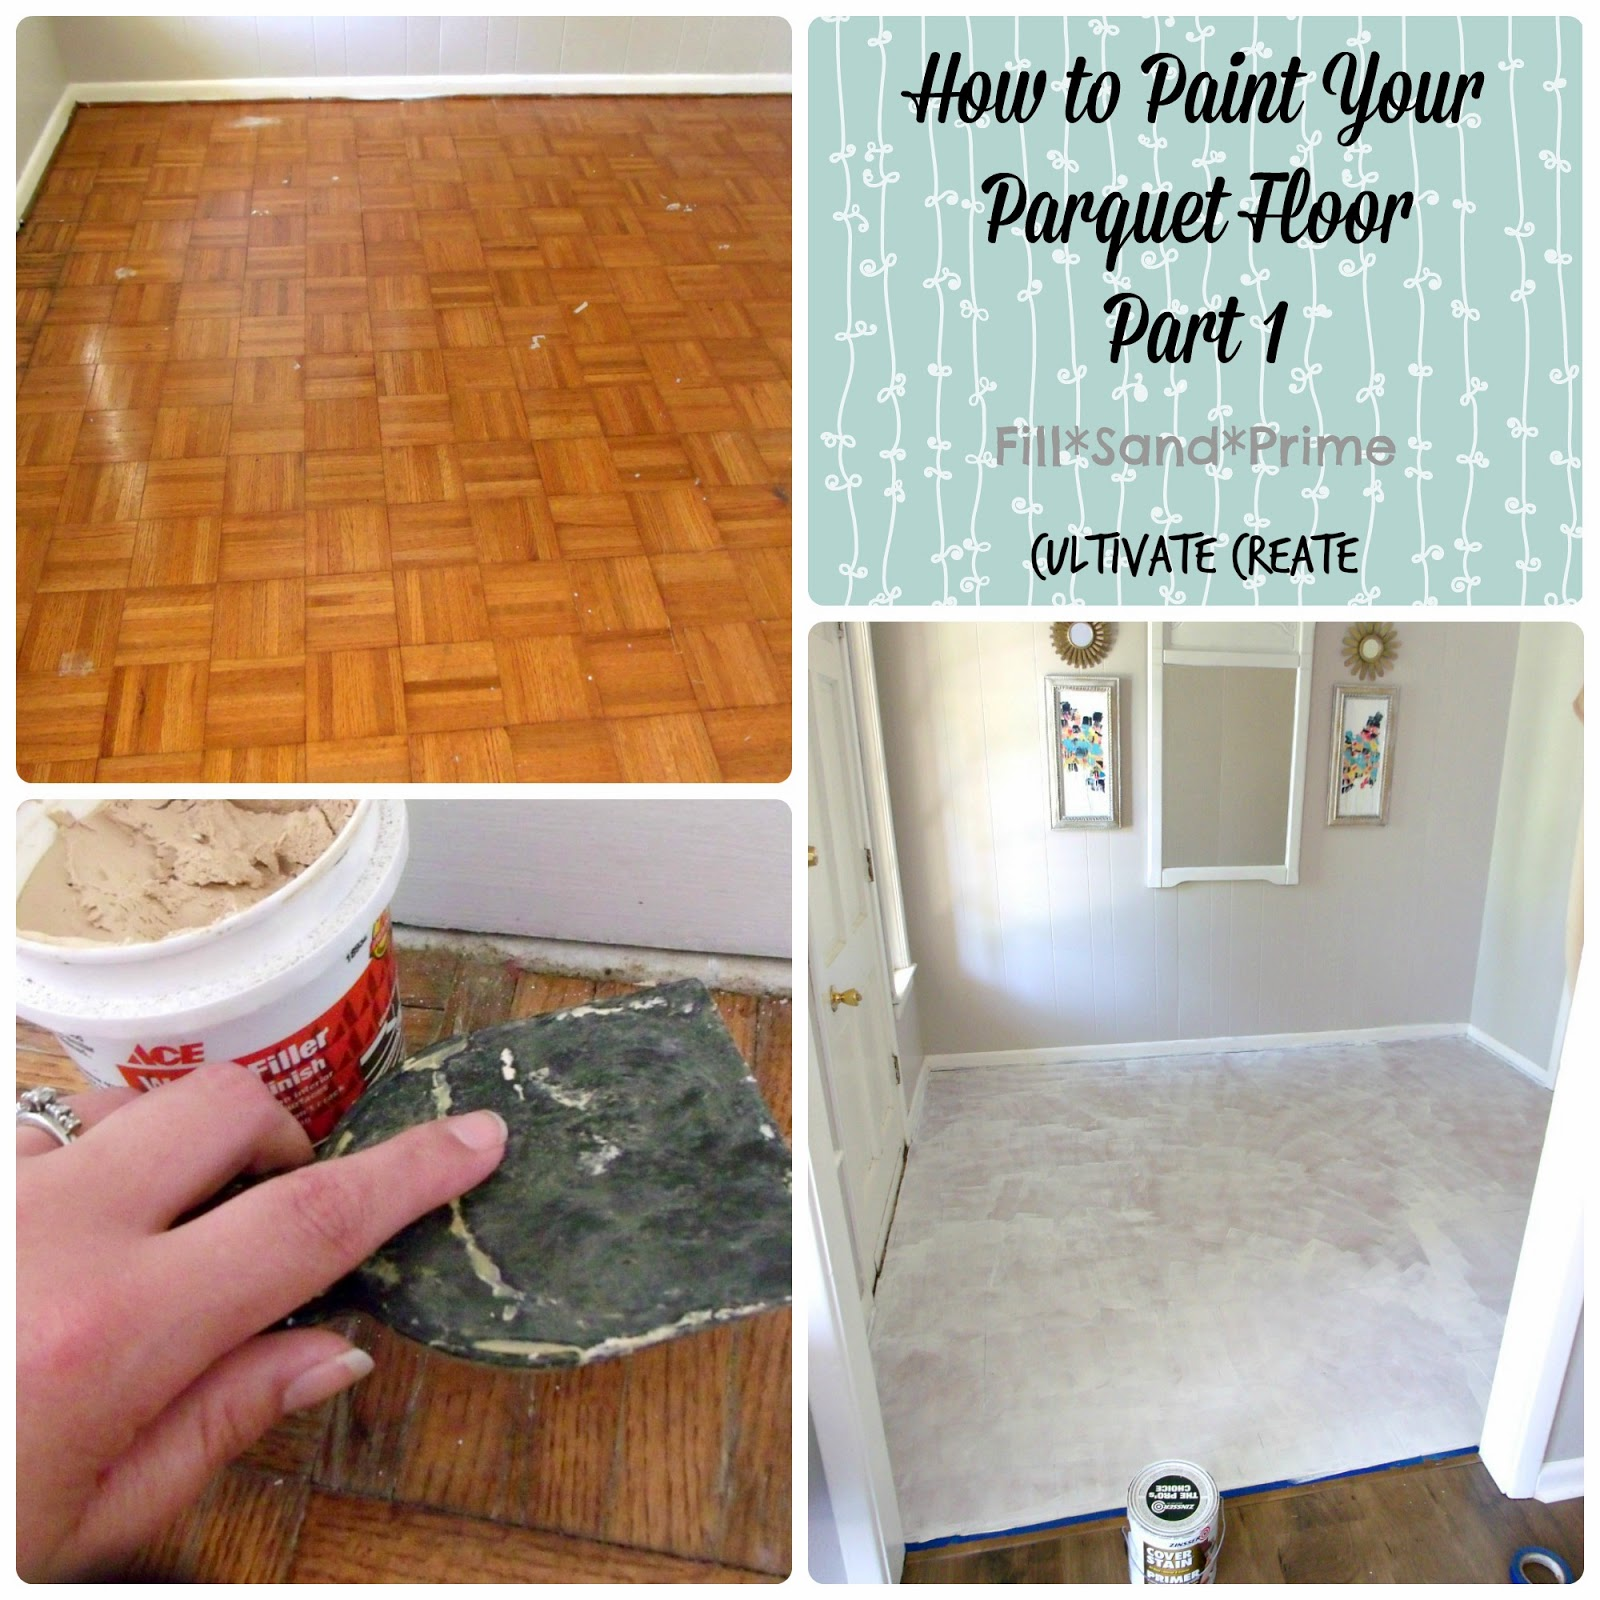 Painted Parquet Kitchen Floor: Cultivate Create: Painted Parquet Floor